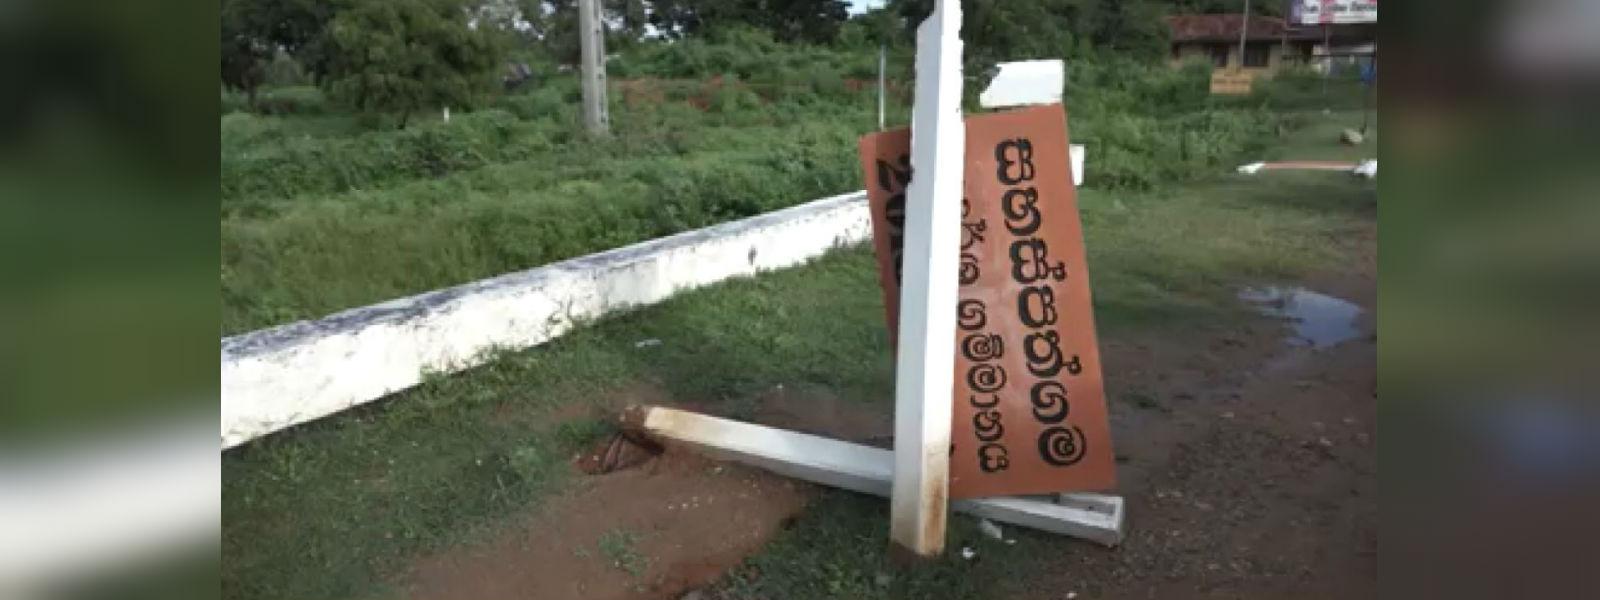 Name boards of several model villages in Sooriyawewa destroyed